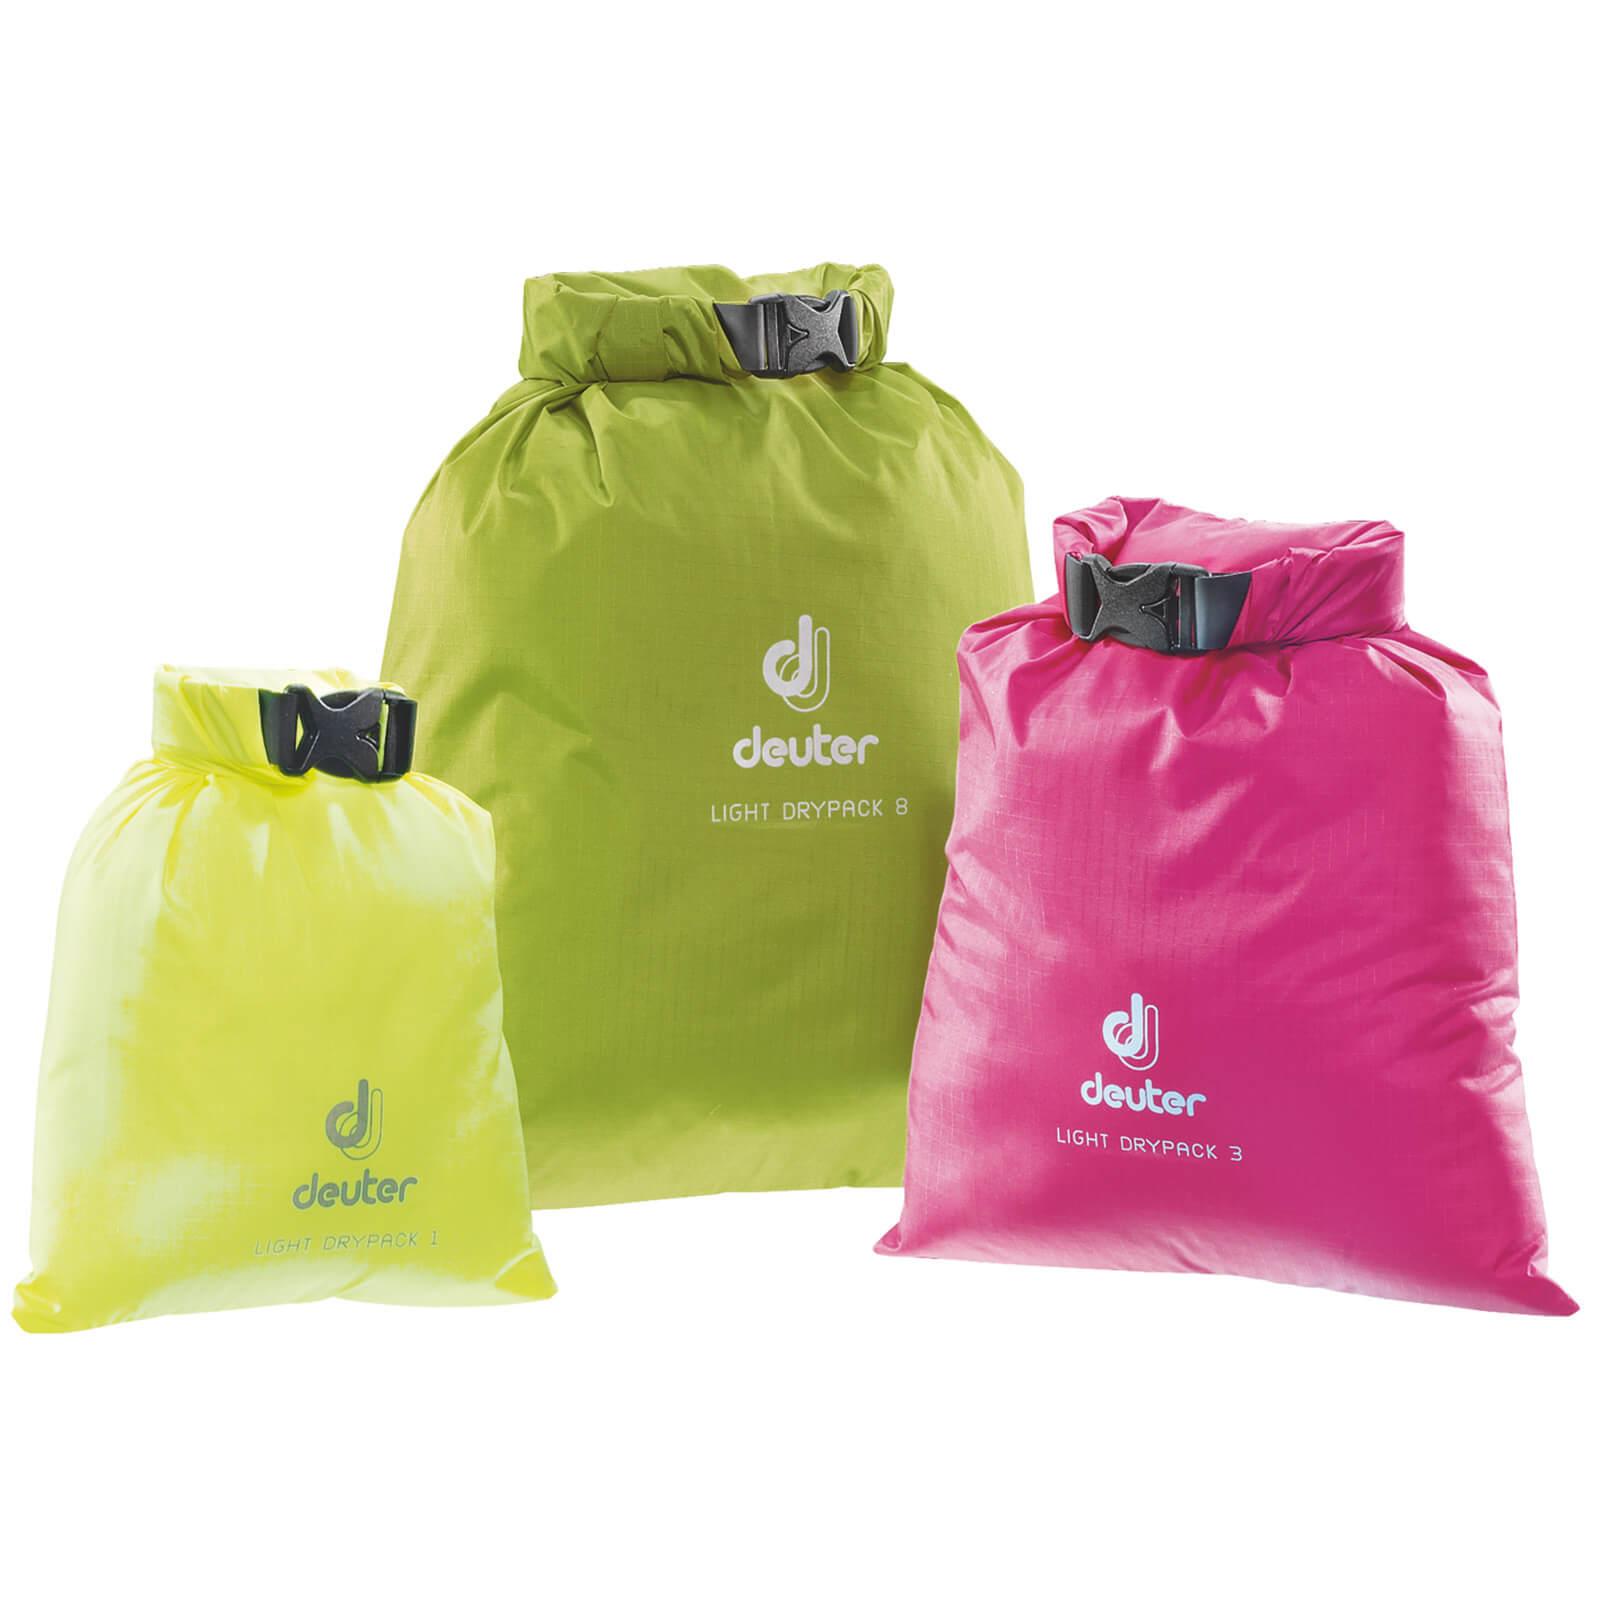 Deuter Lite Drypack - 25L - Sun